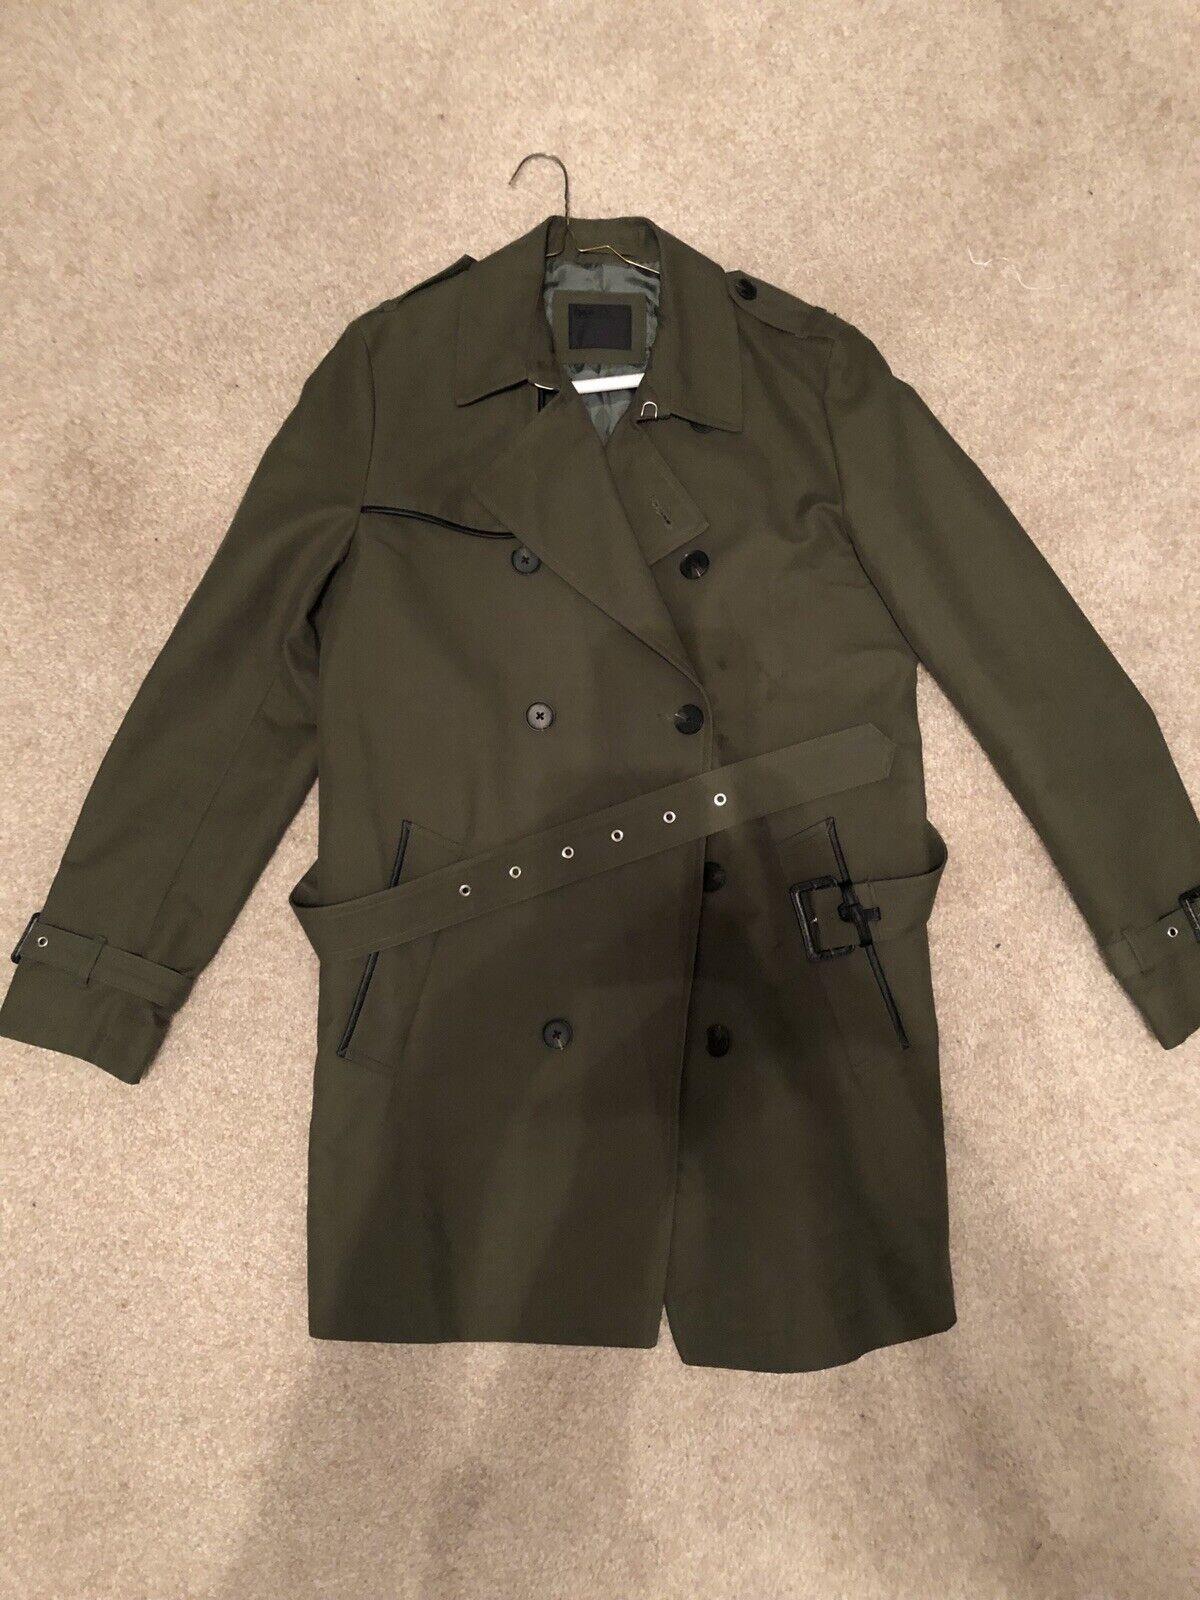 Asos Trench Coat Size Small Men's